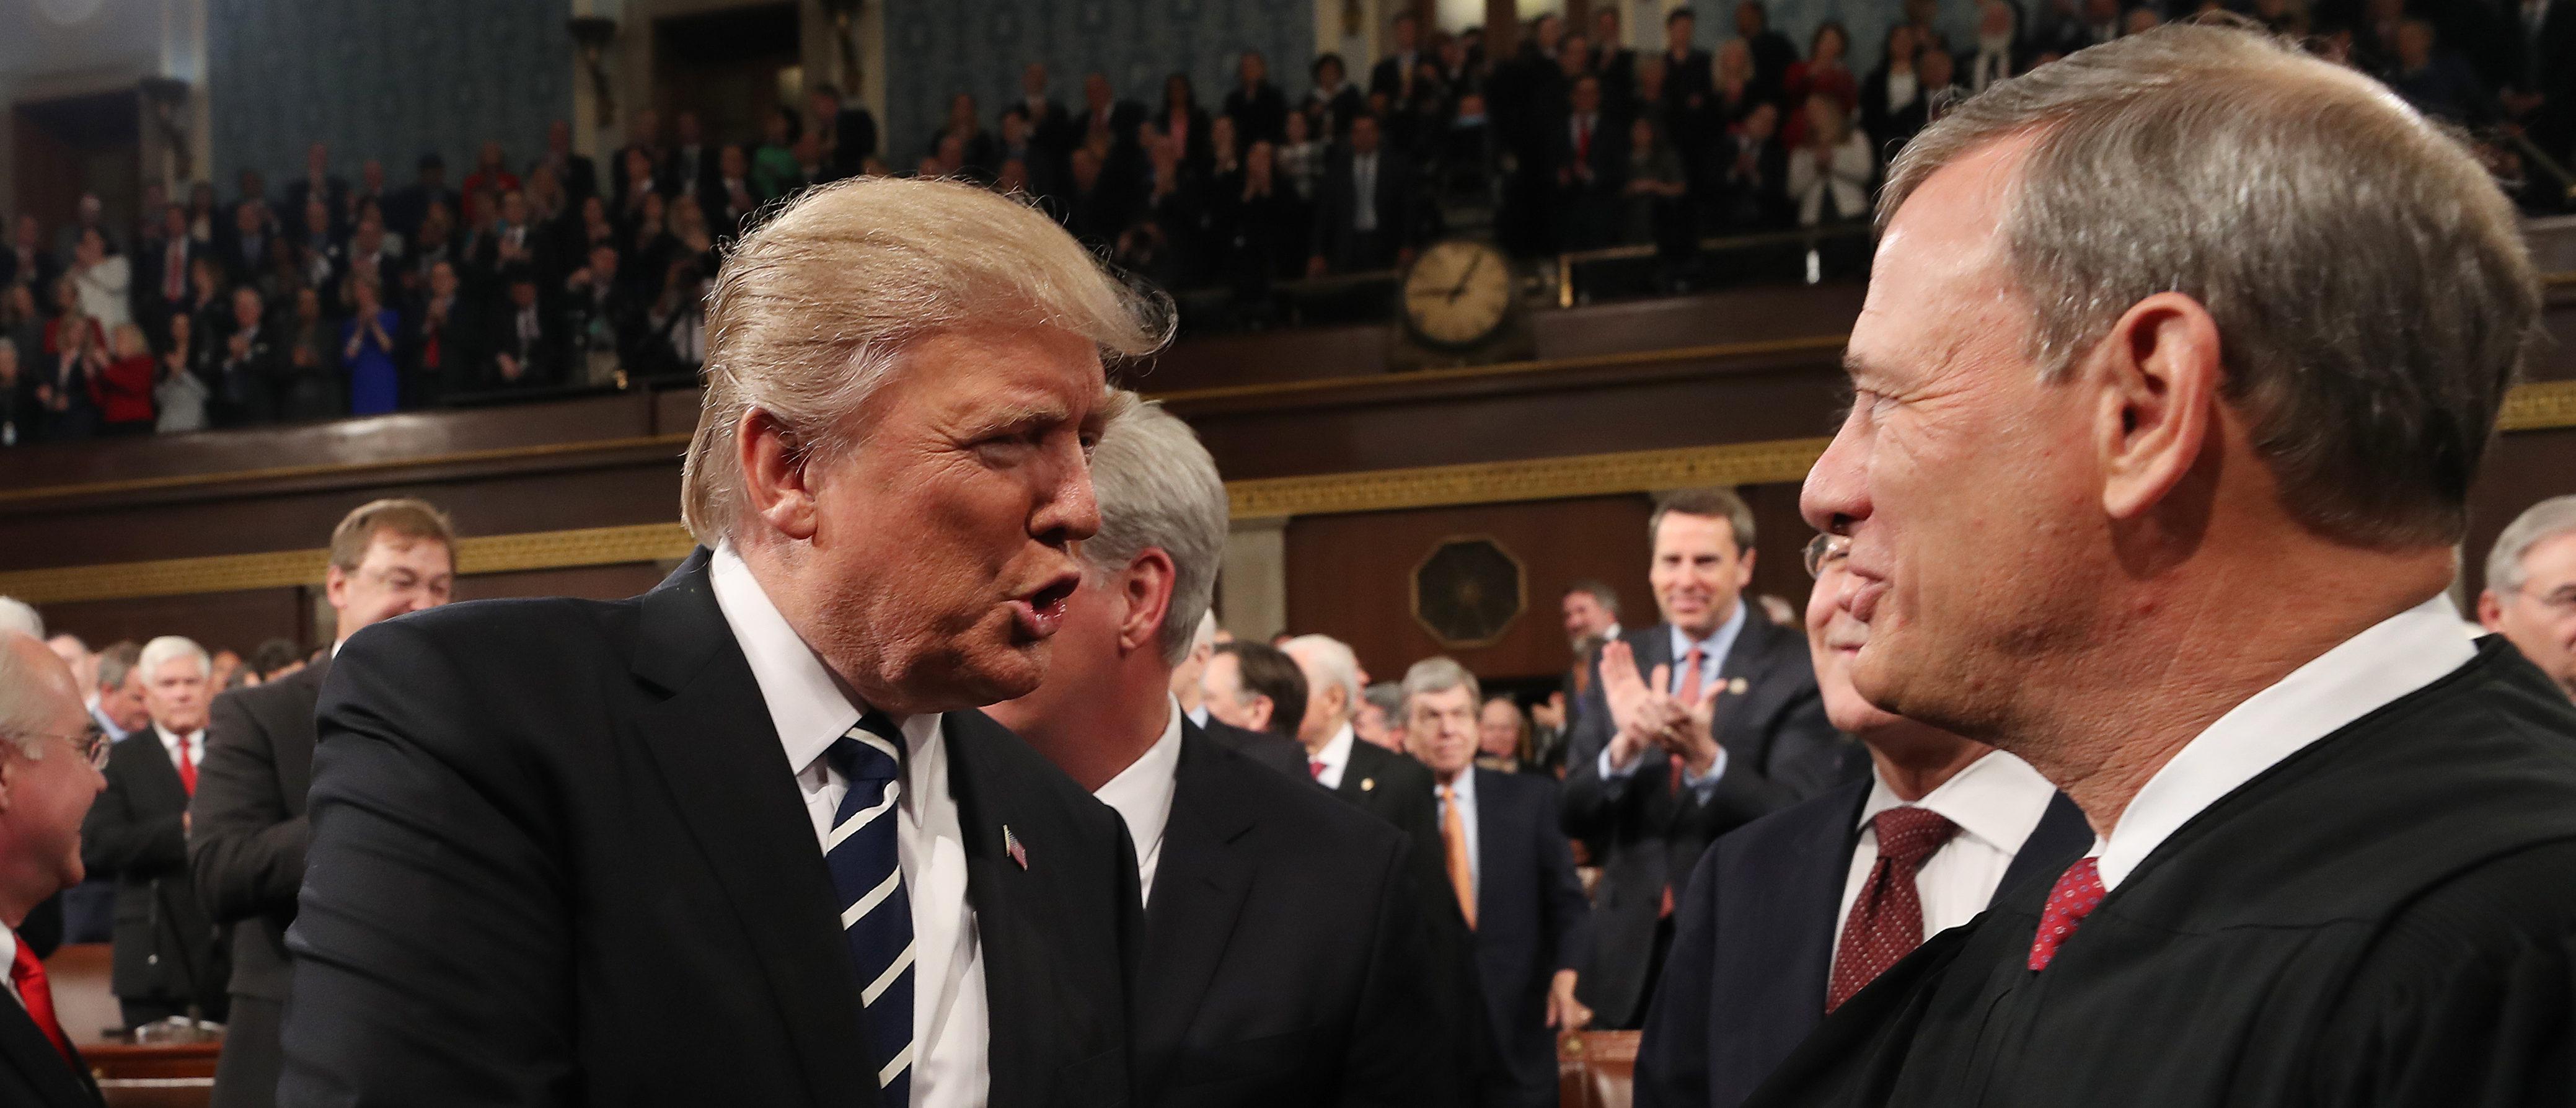 Barrett, Judicial Panel Back Chief's Rebuke Of Trump For 'Obama Judges' Insult